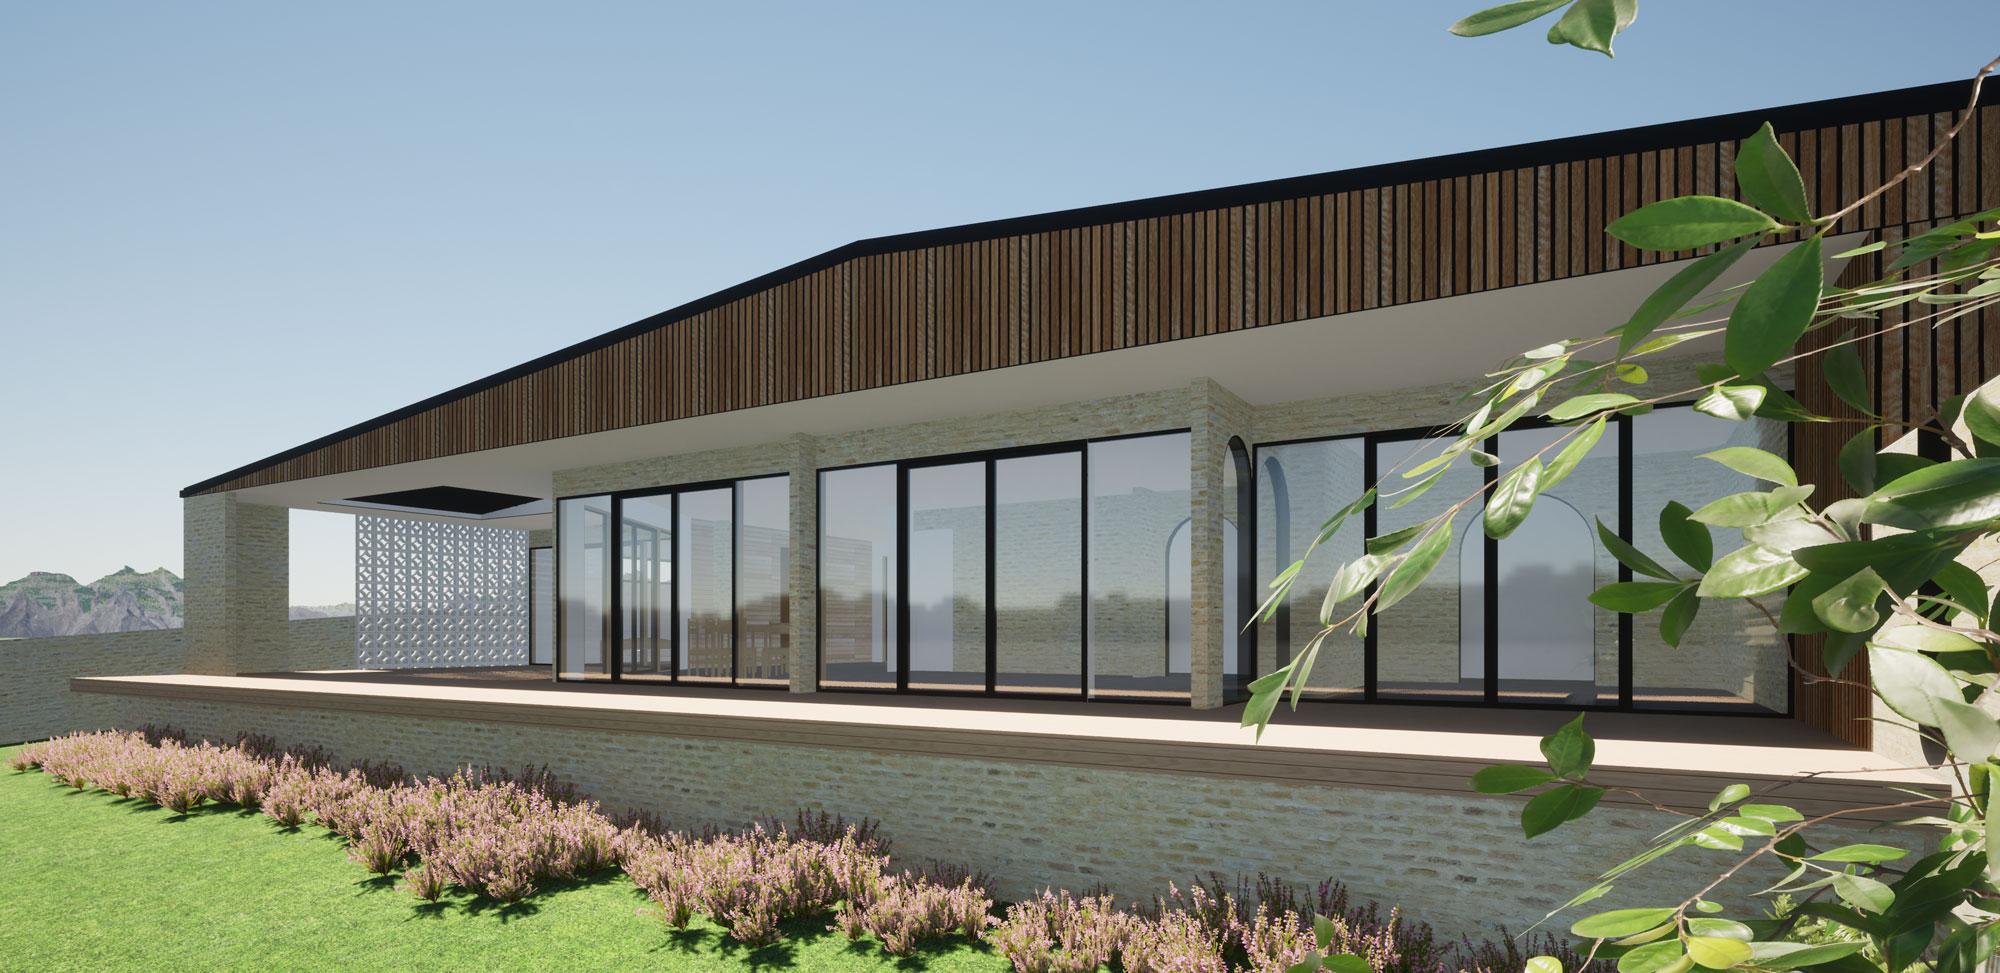 Meadowstone, Wanaka view 4 by Architecture Design Studio